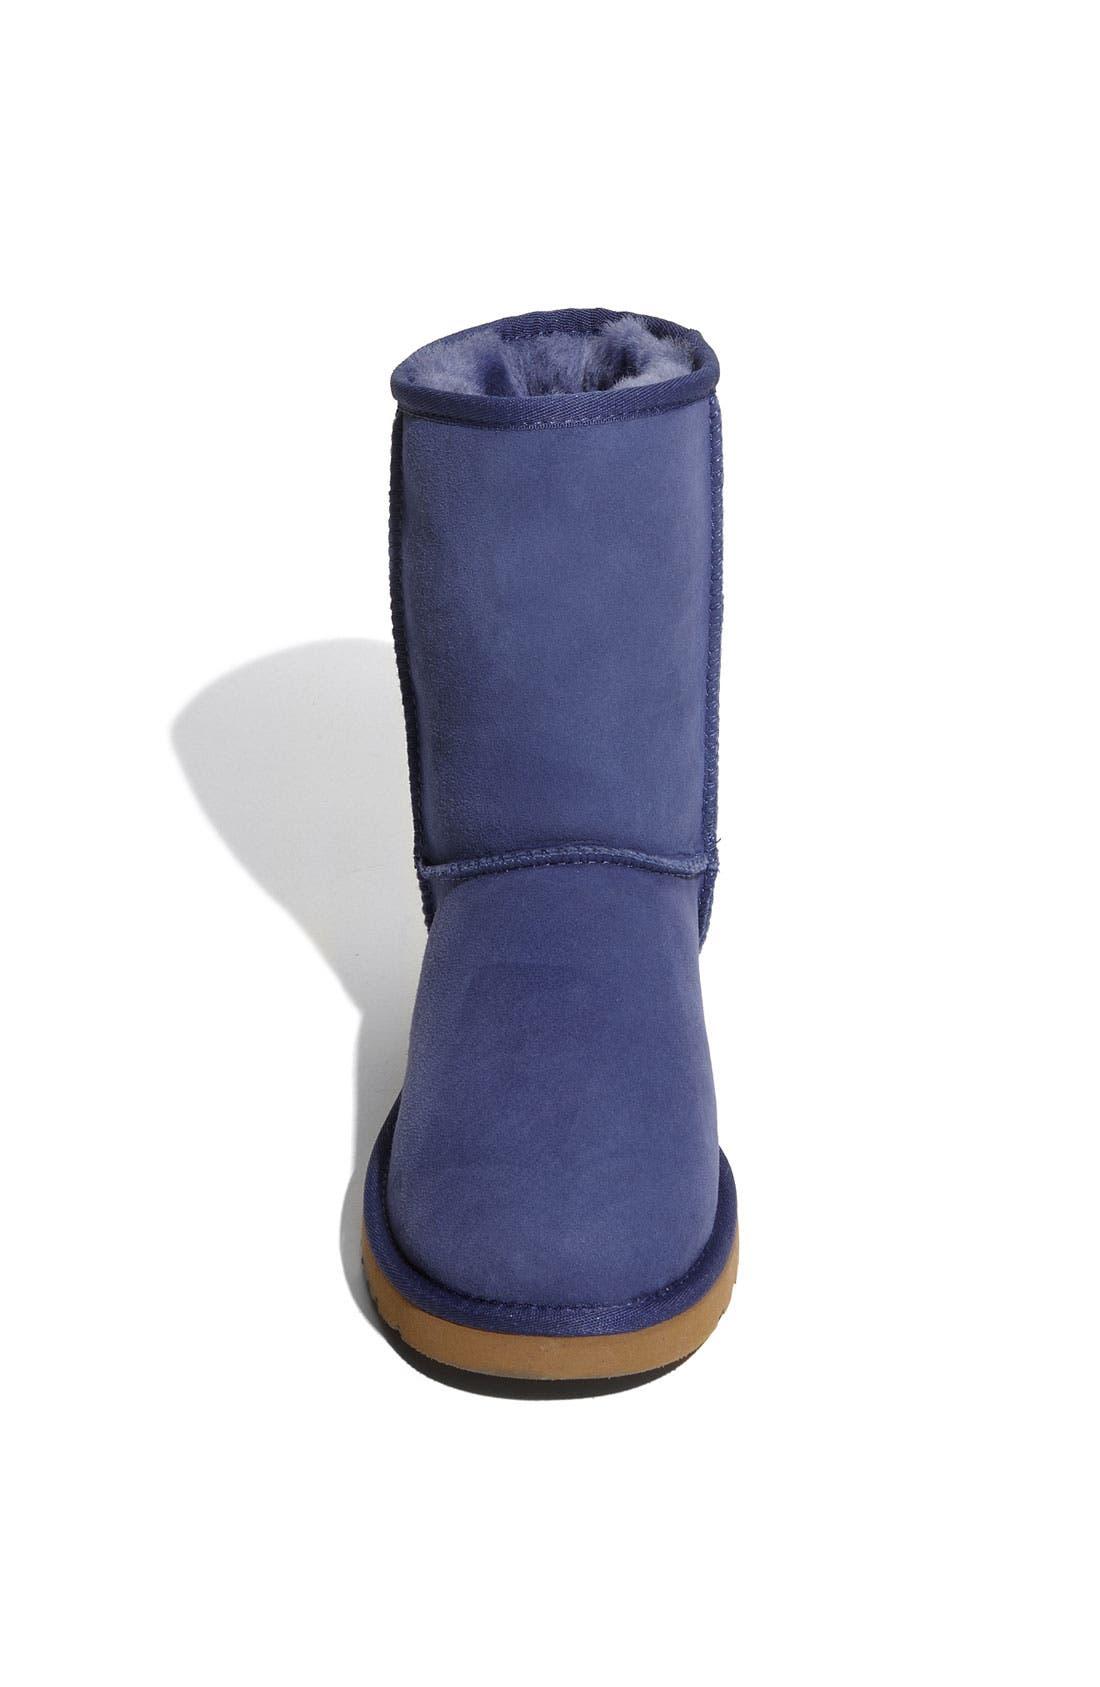 Alternate Image 3  - UGG® 'Classic Short' Boot (Women)